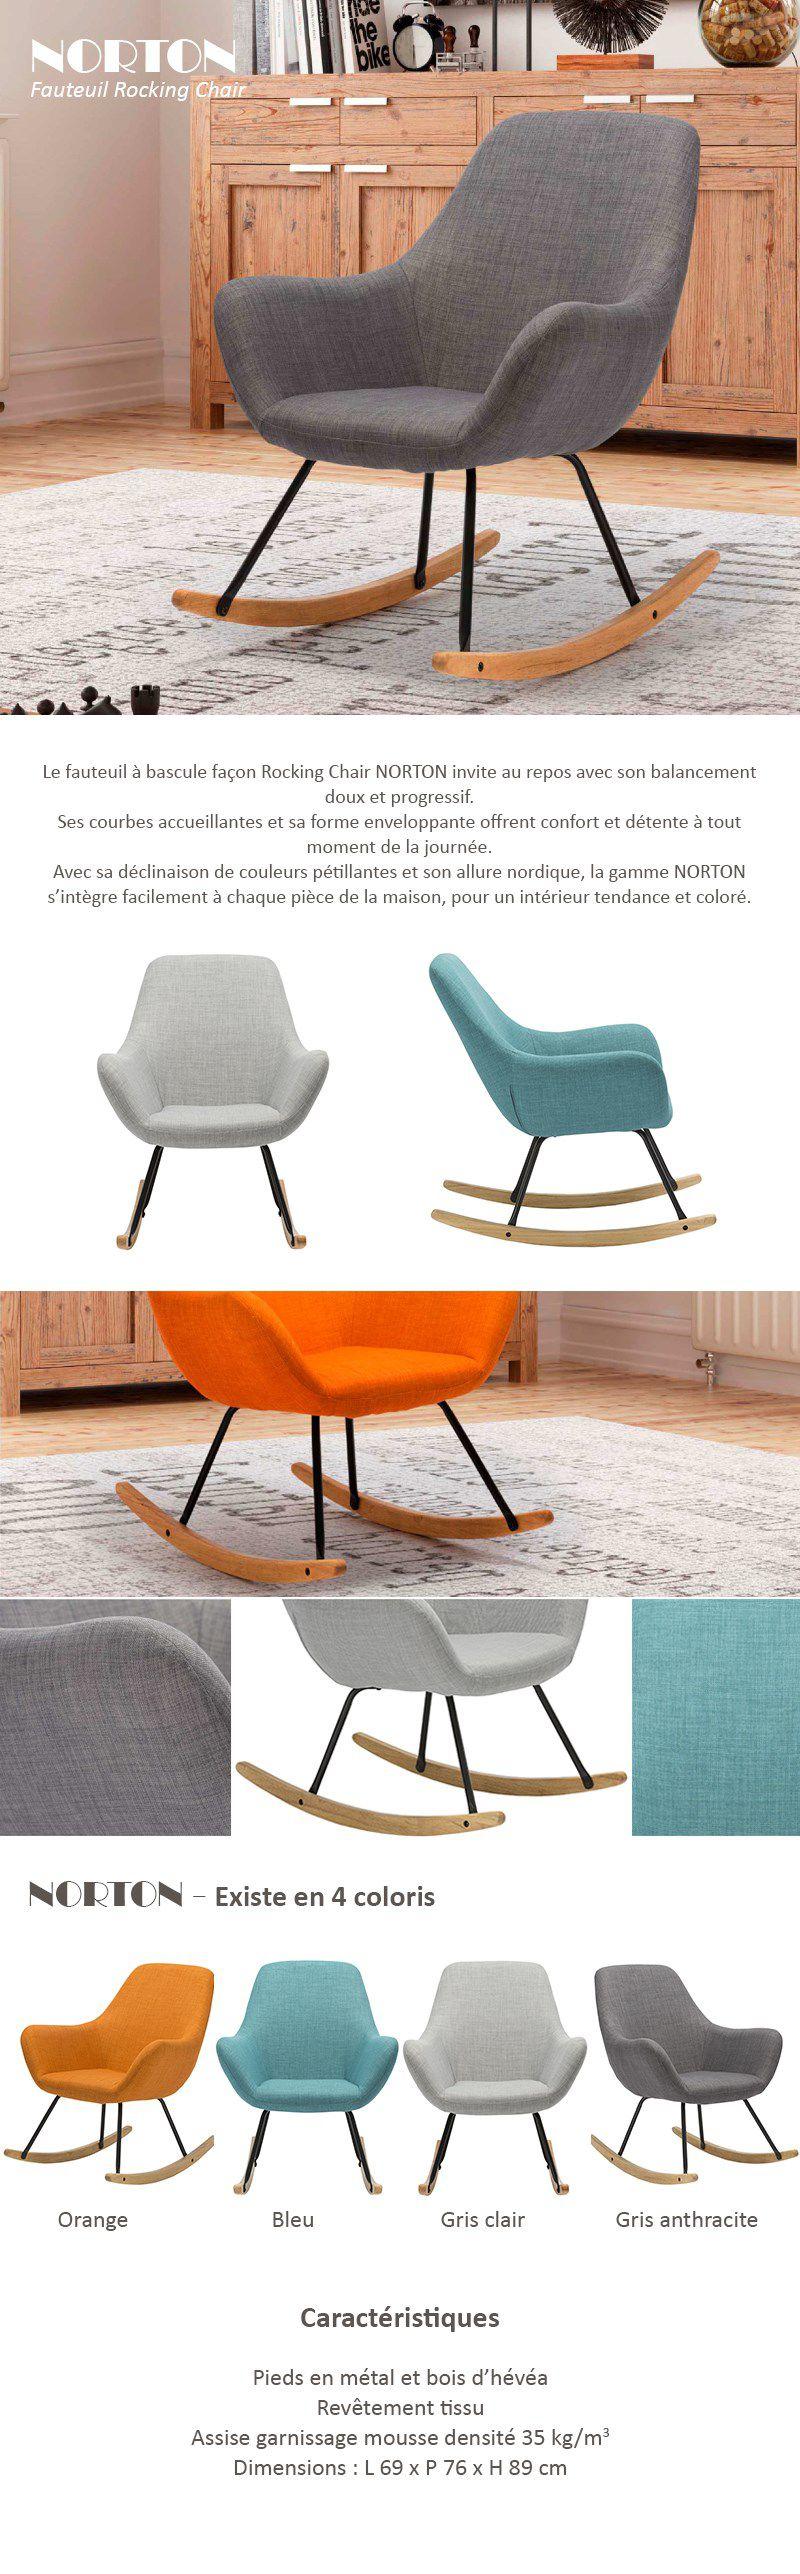 Norton Fauteuil Rocking Chair En Tissu Gris Anthracite Pieds